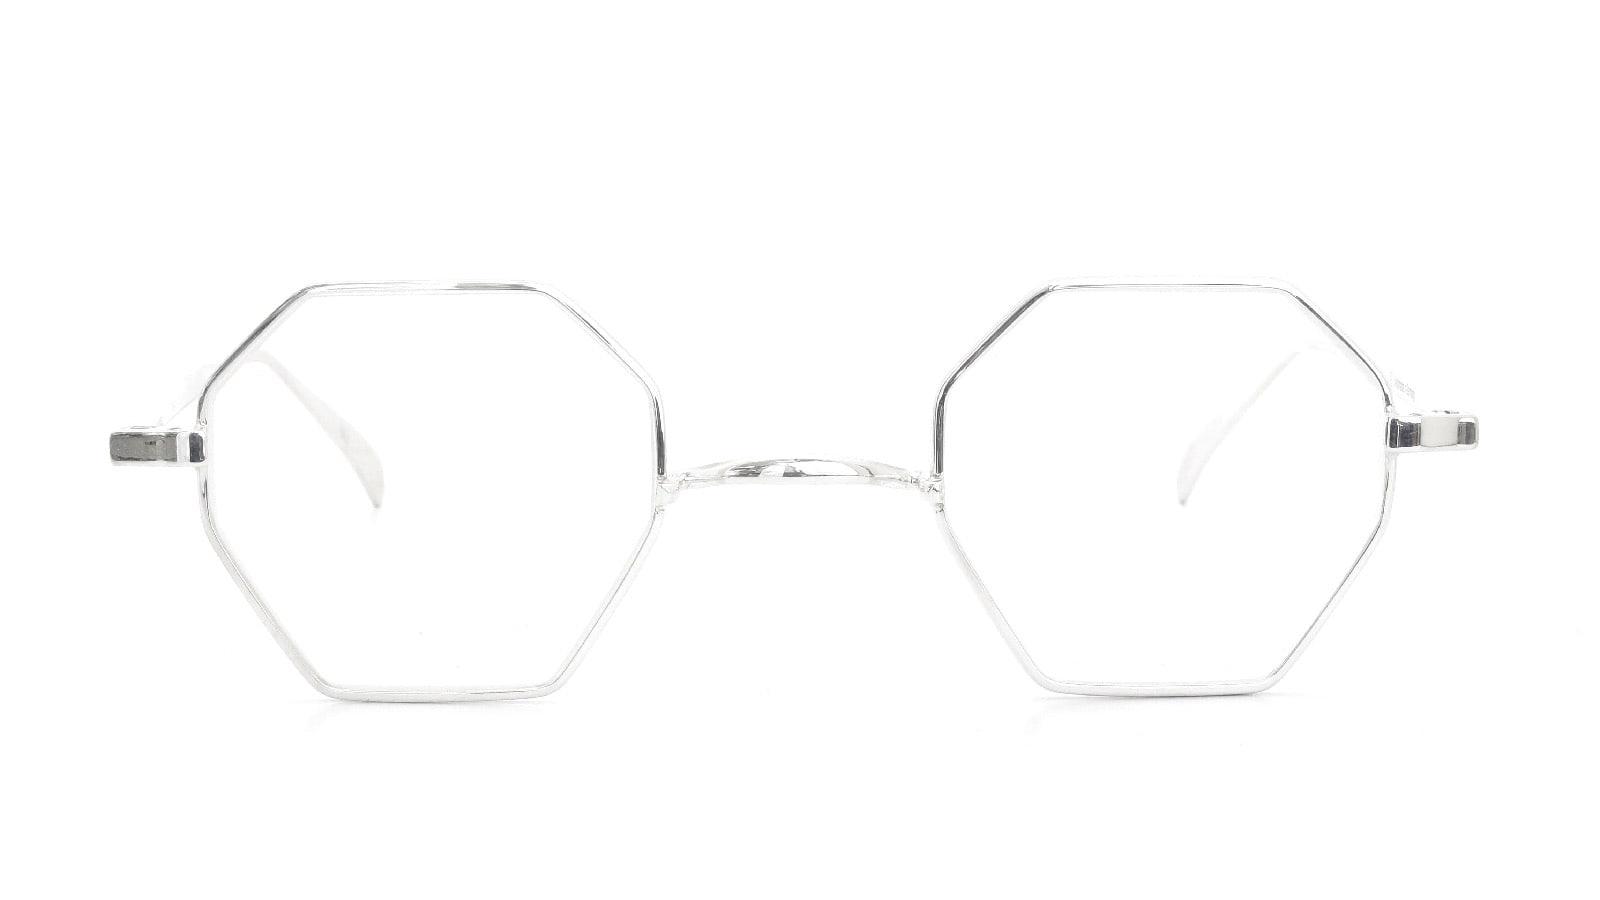 GERNOT LINDNER GL150 mod.159 Medium-Bridge Golf SN-X (Silver without coating) 2